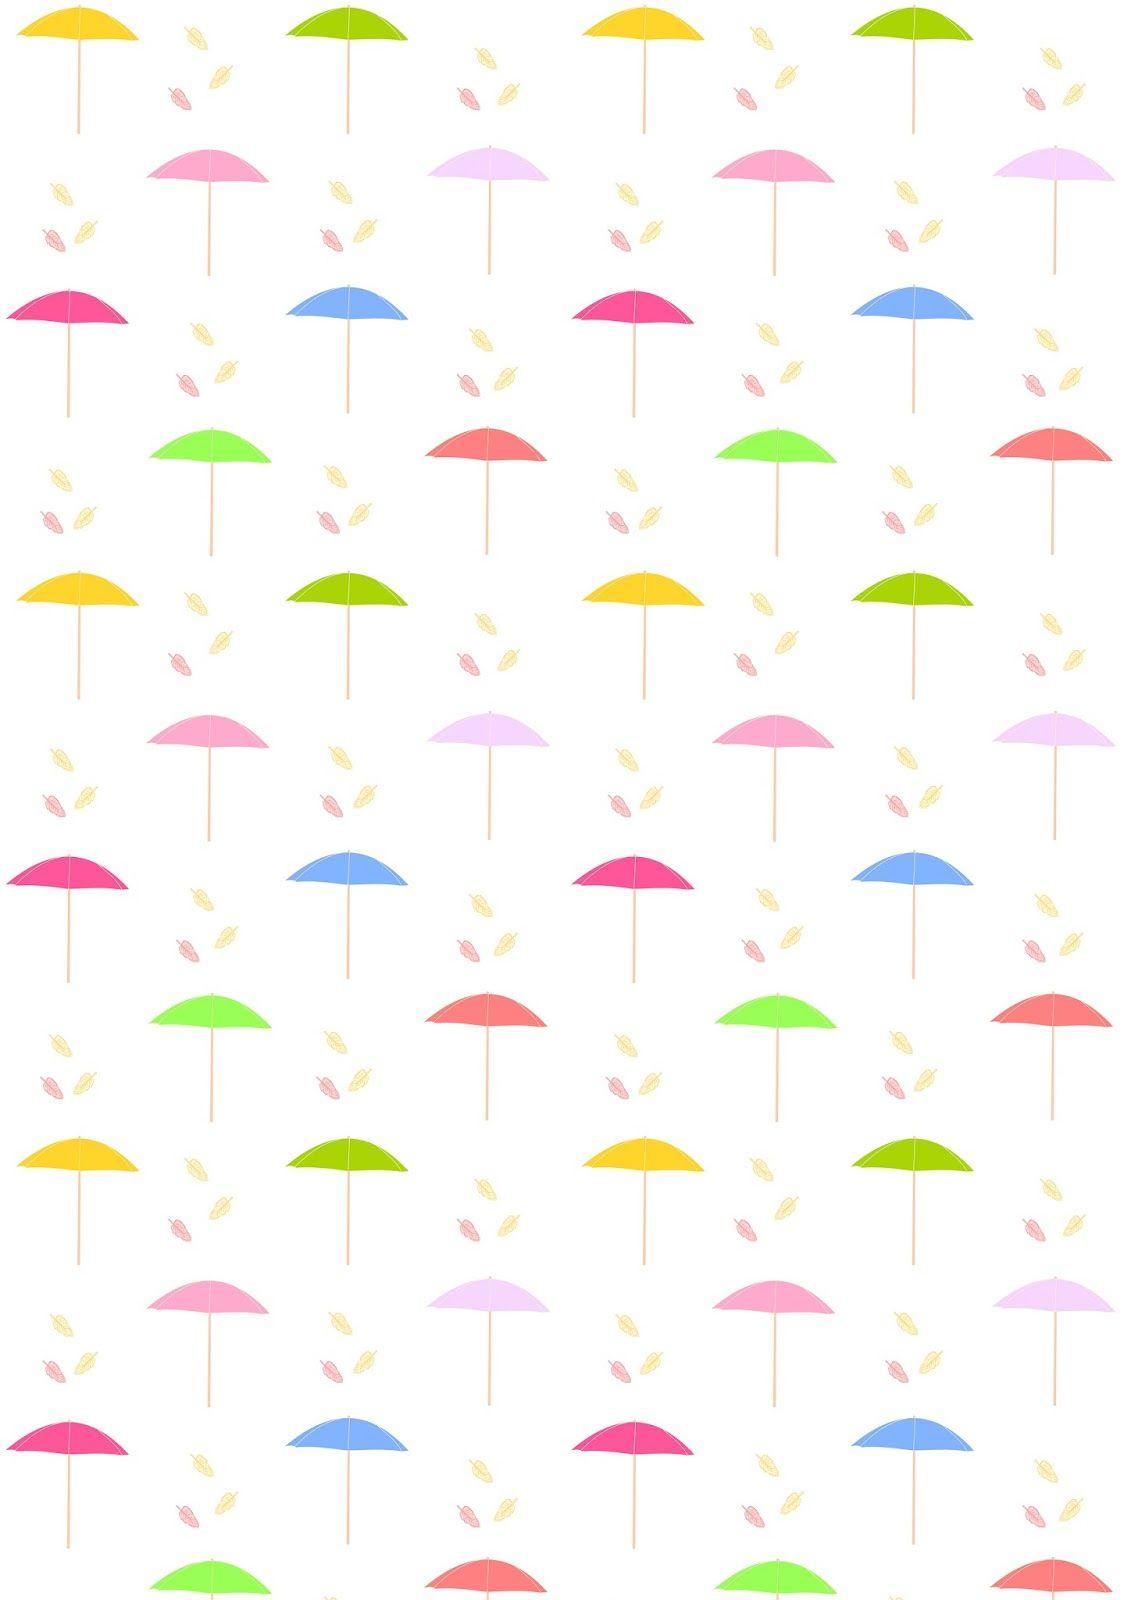 Free Digital Parasol Scrapbooking Paper - Ausdruckbares - Free Printable Scrapbook Paper